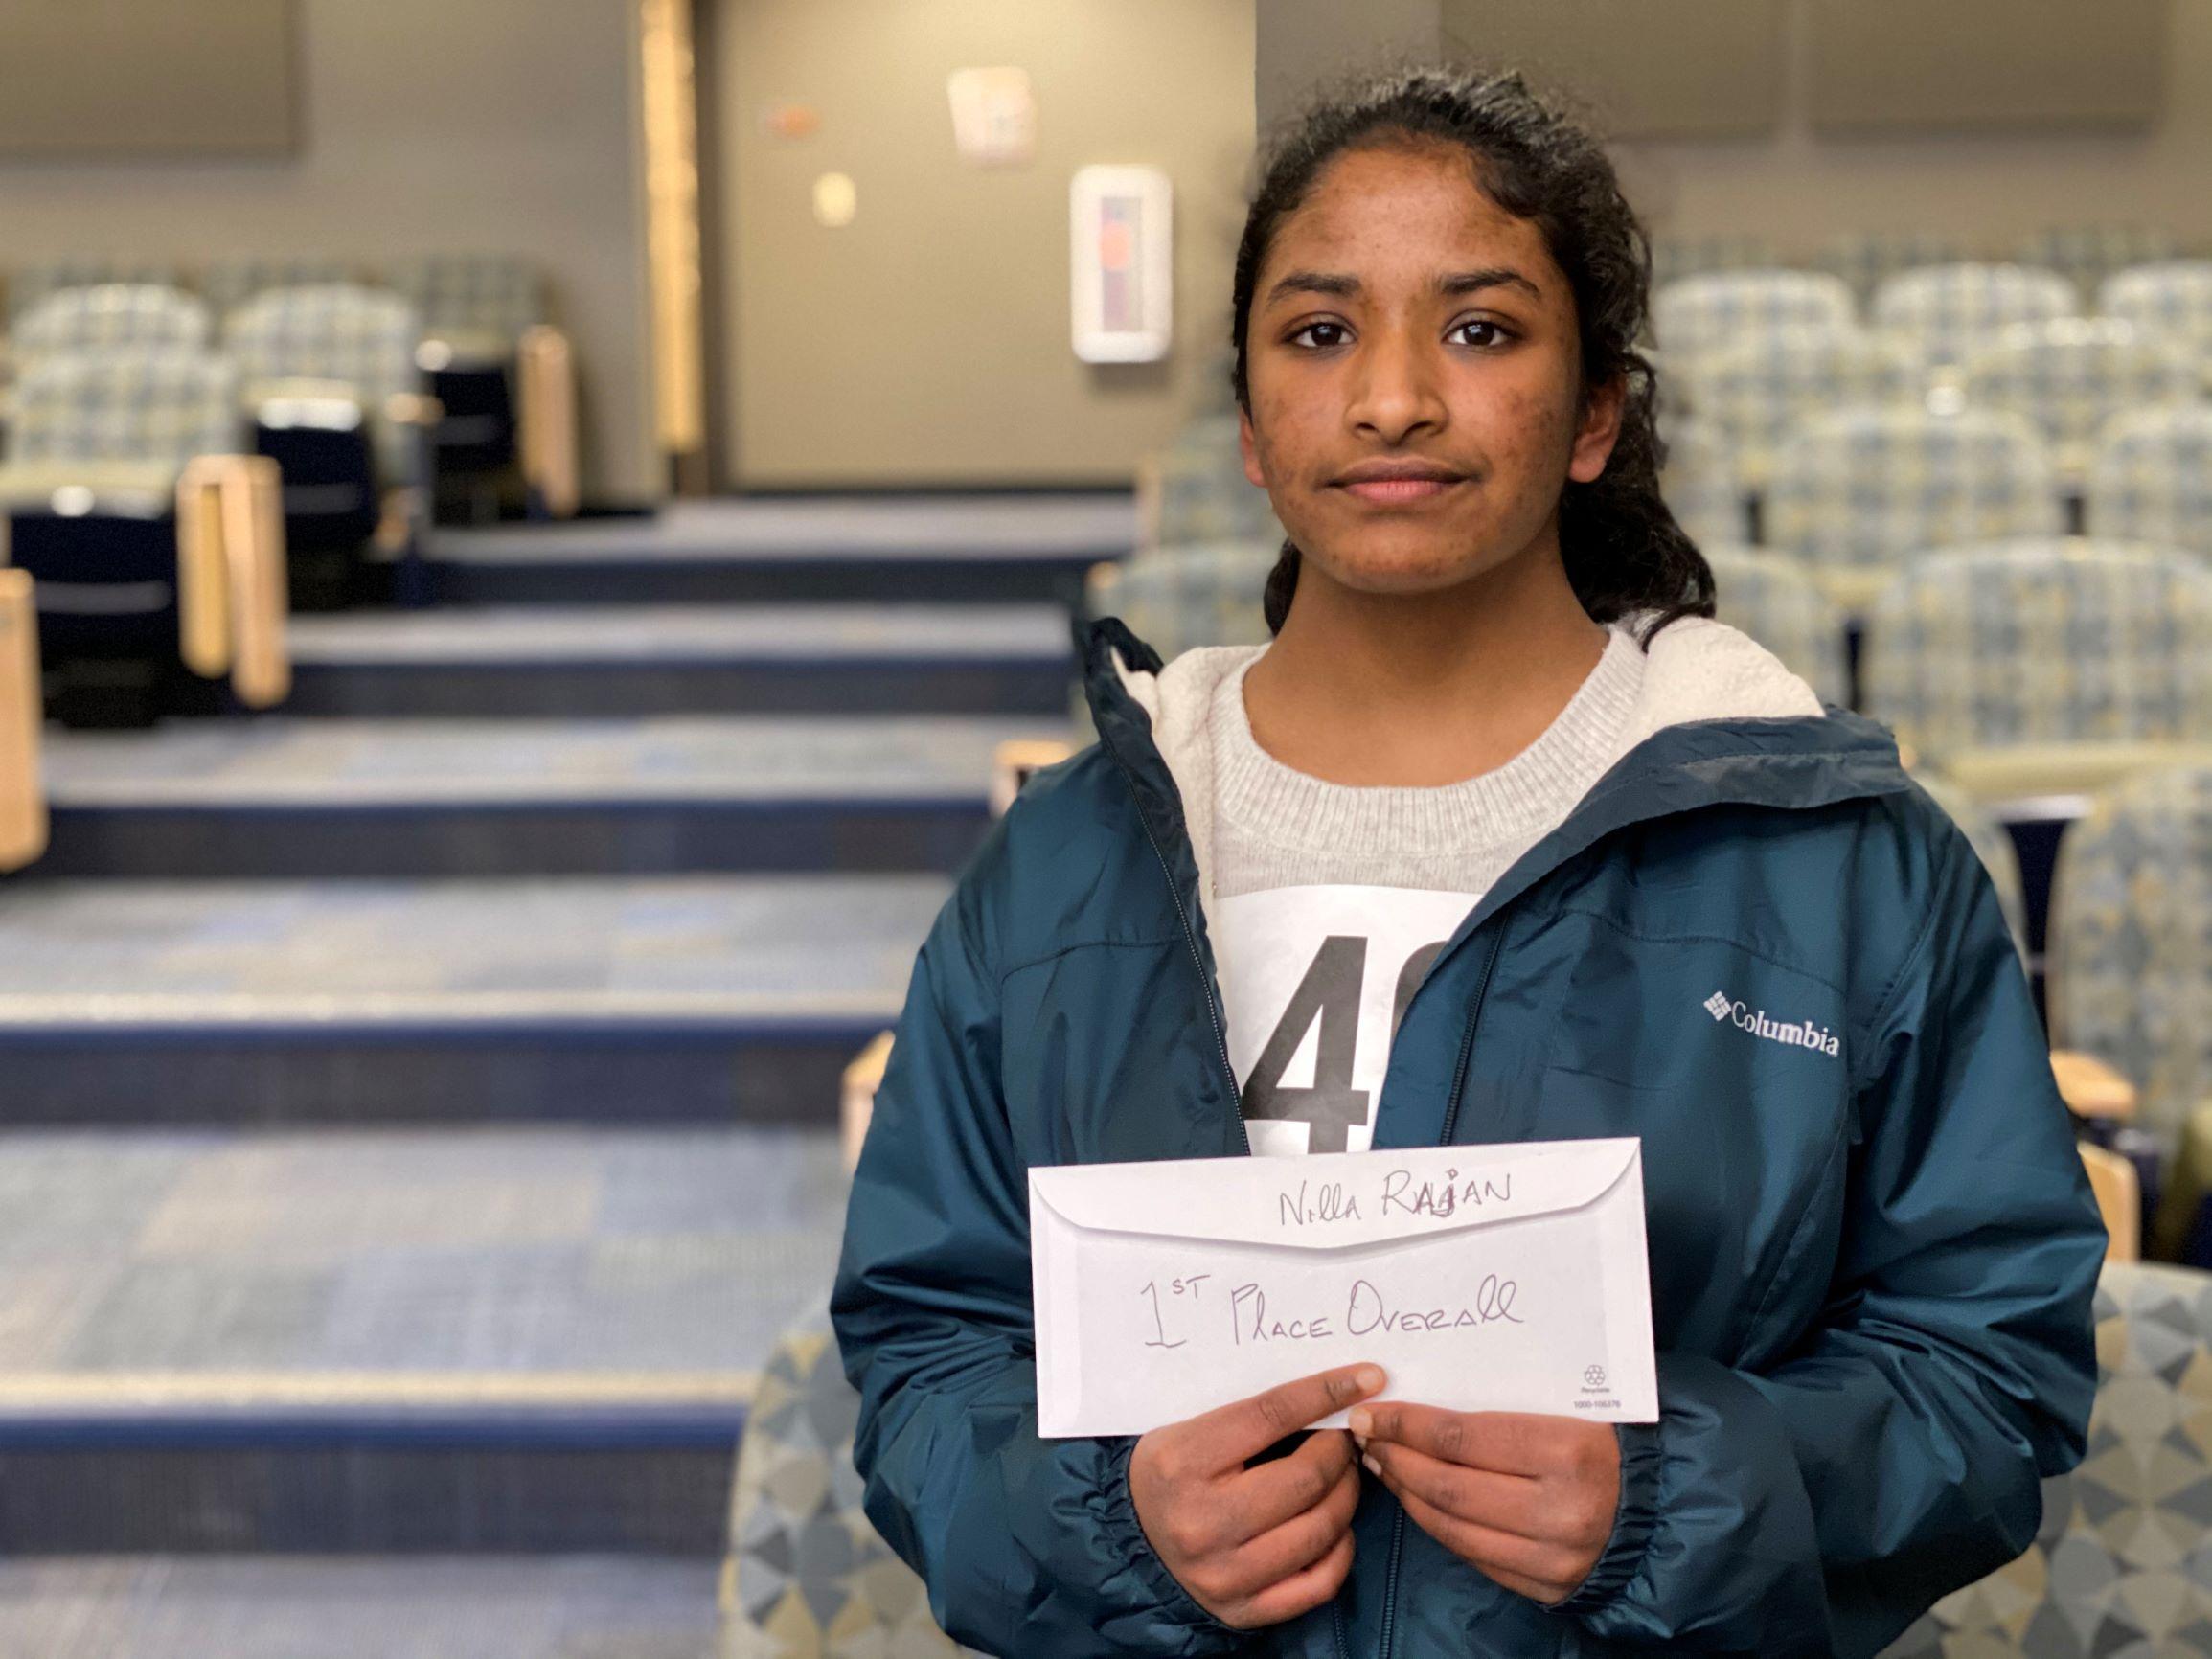 Regional Brain Bee winner Nilla Rajan